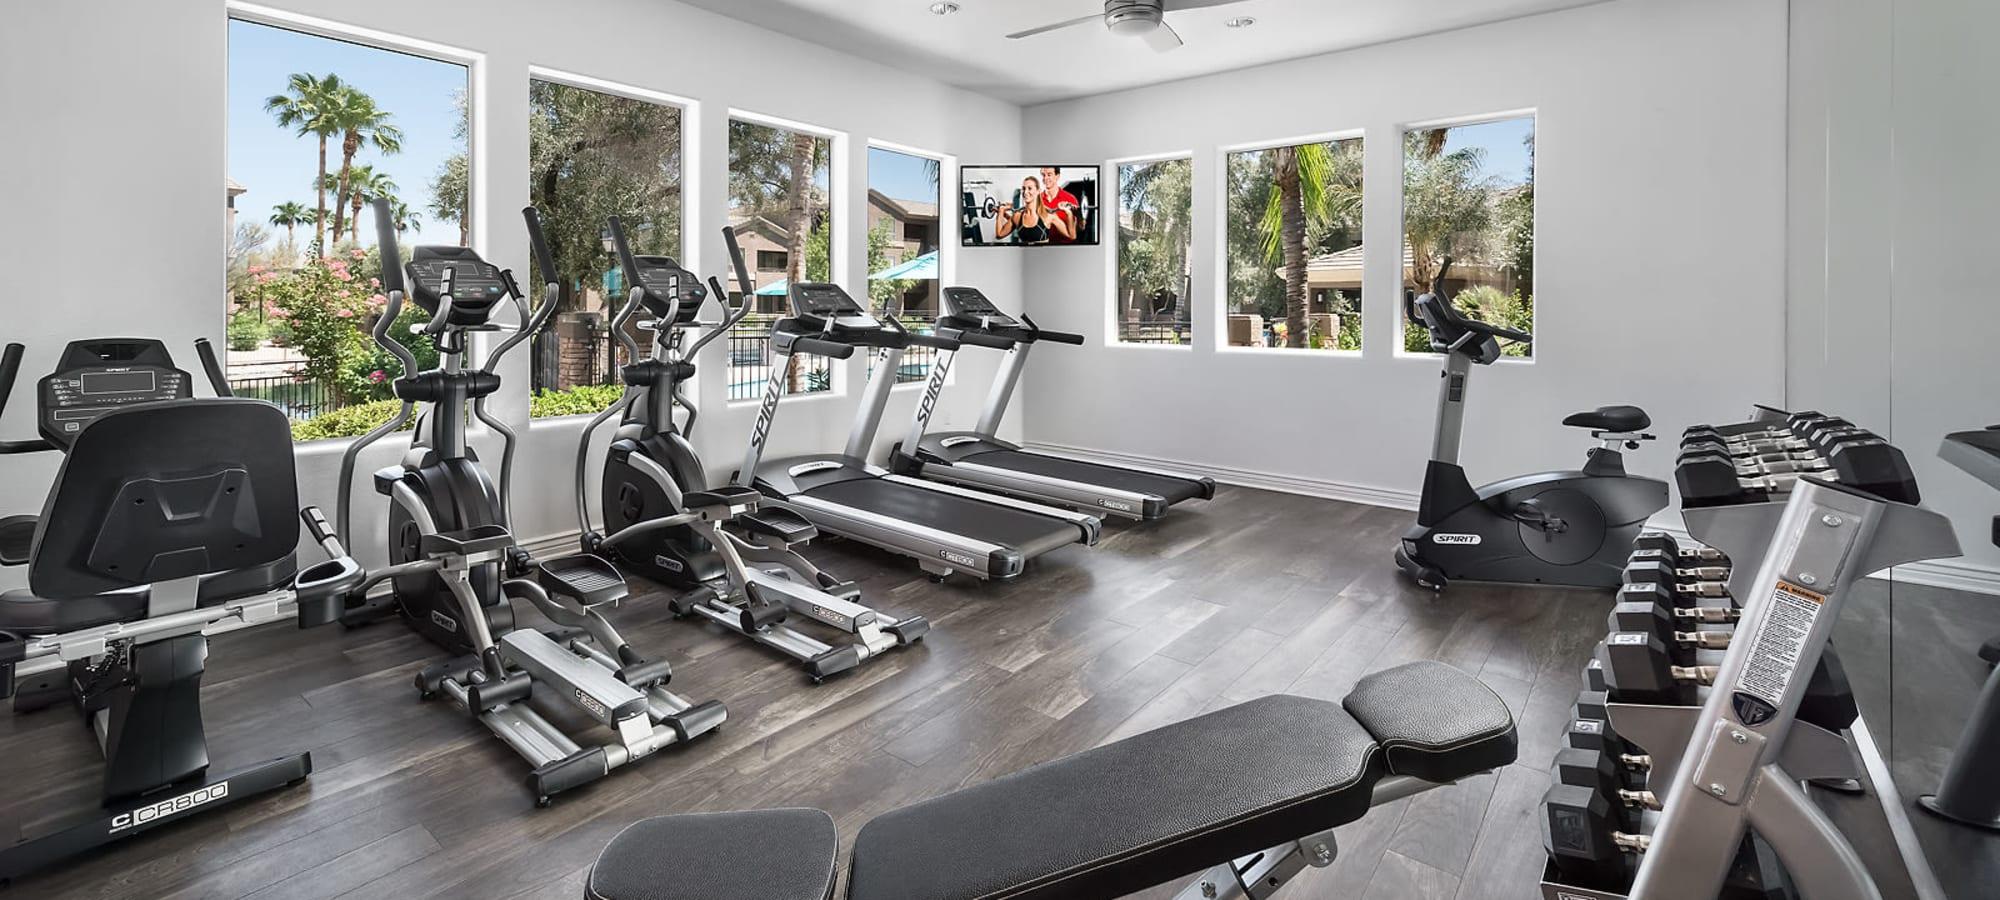 Fitness Center at Laguna at Arrowhead Ranch in Glendale, Arizona